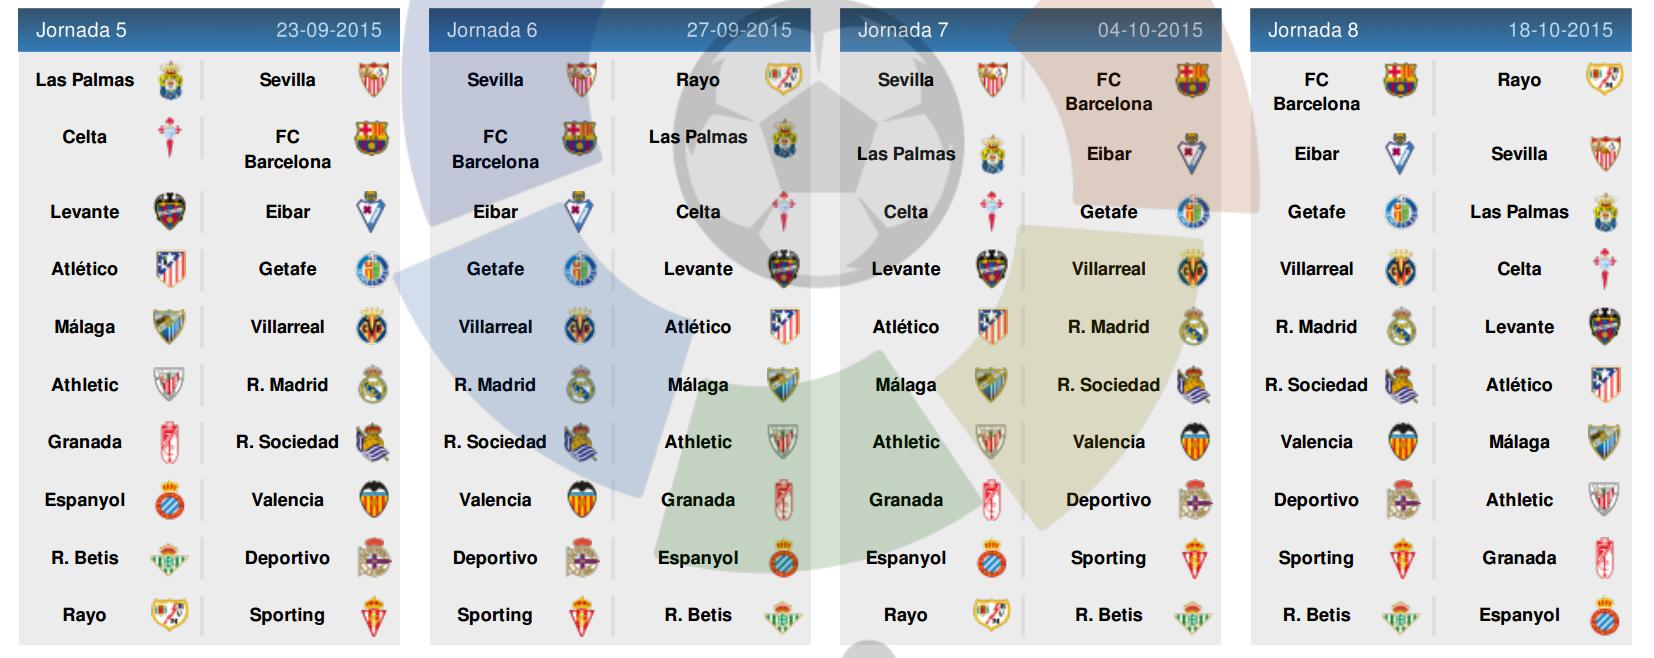 Jadwal Liga Spanyol 2015-2016